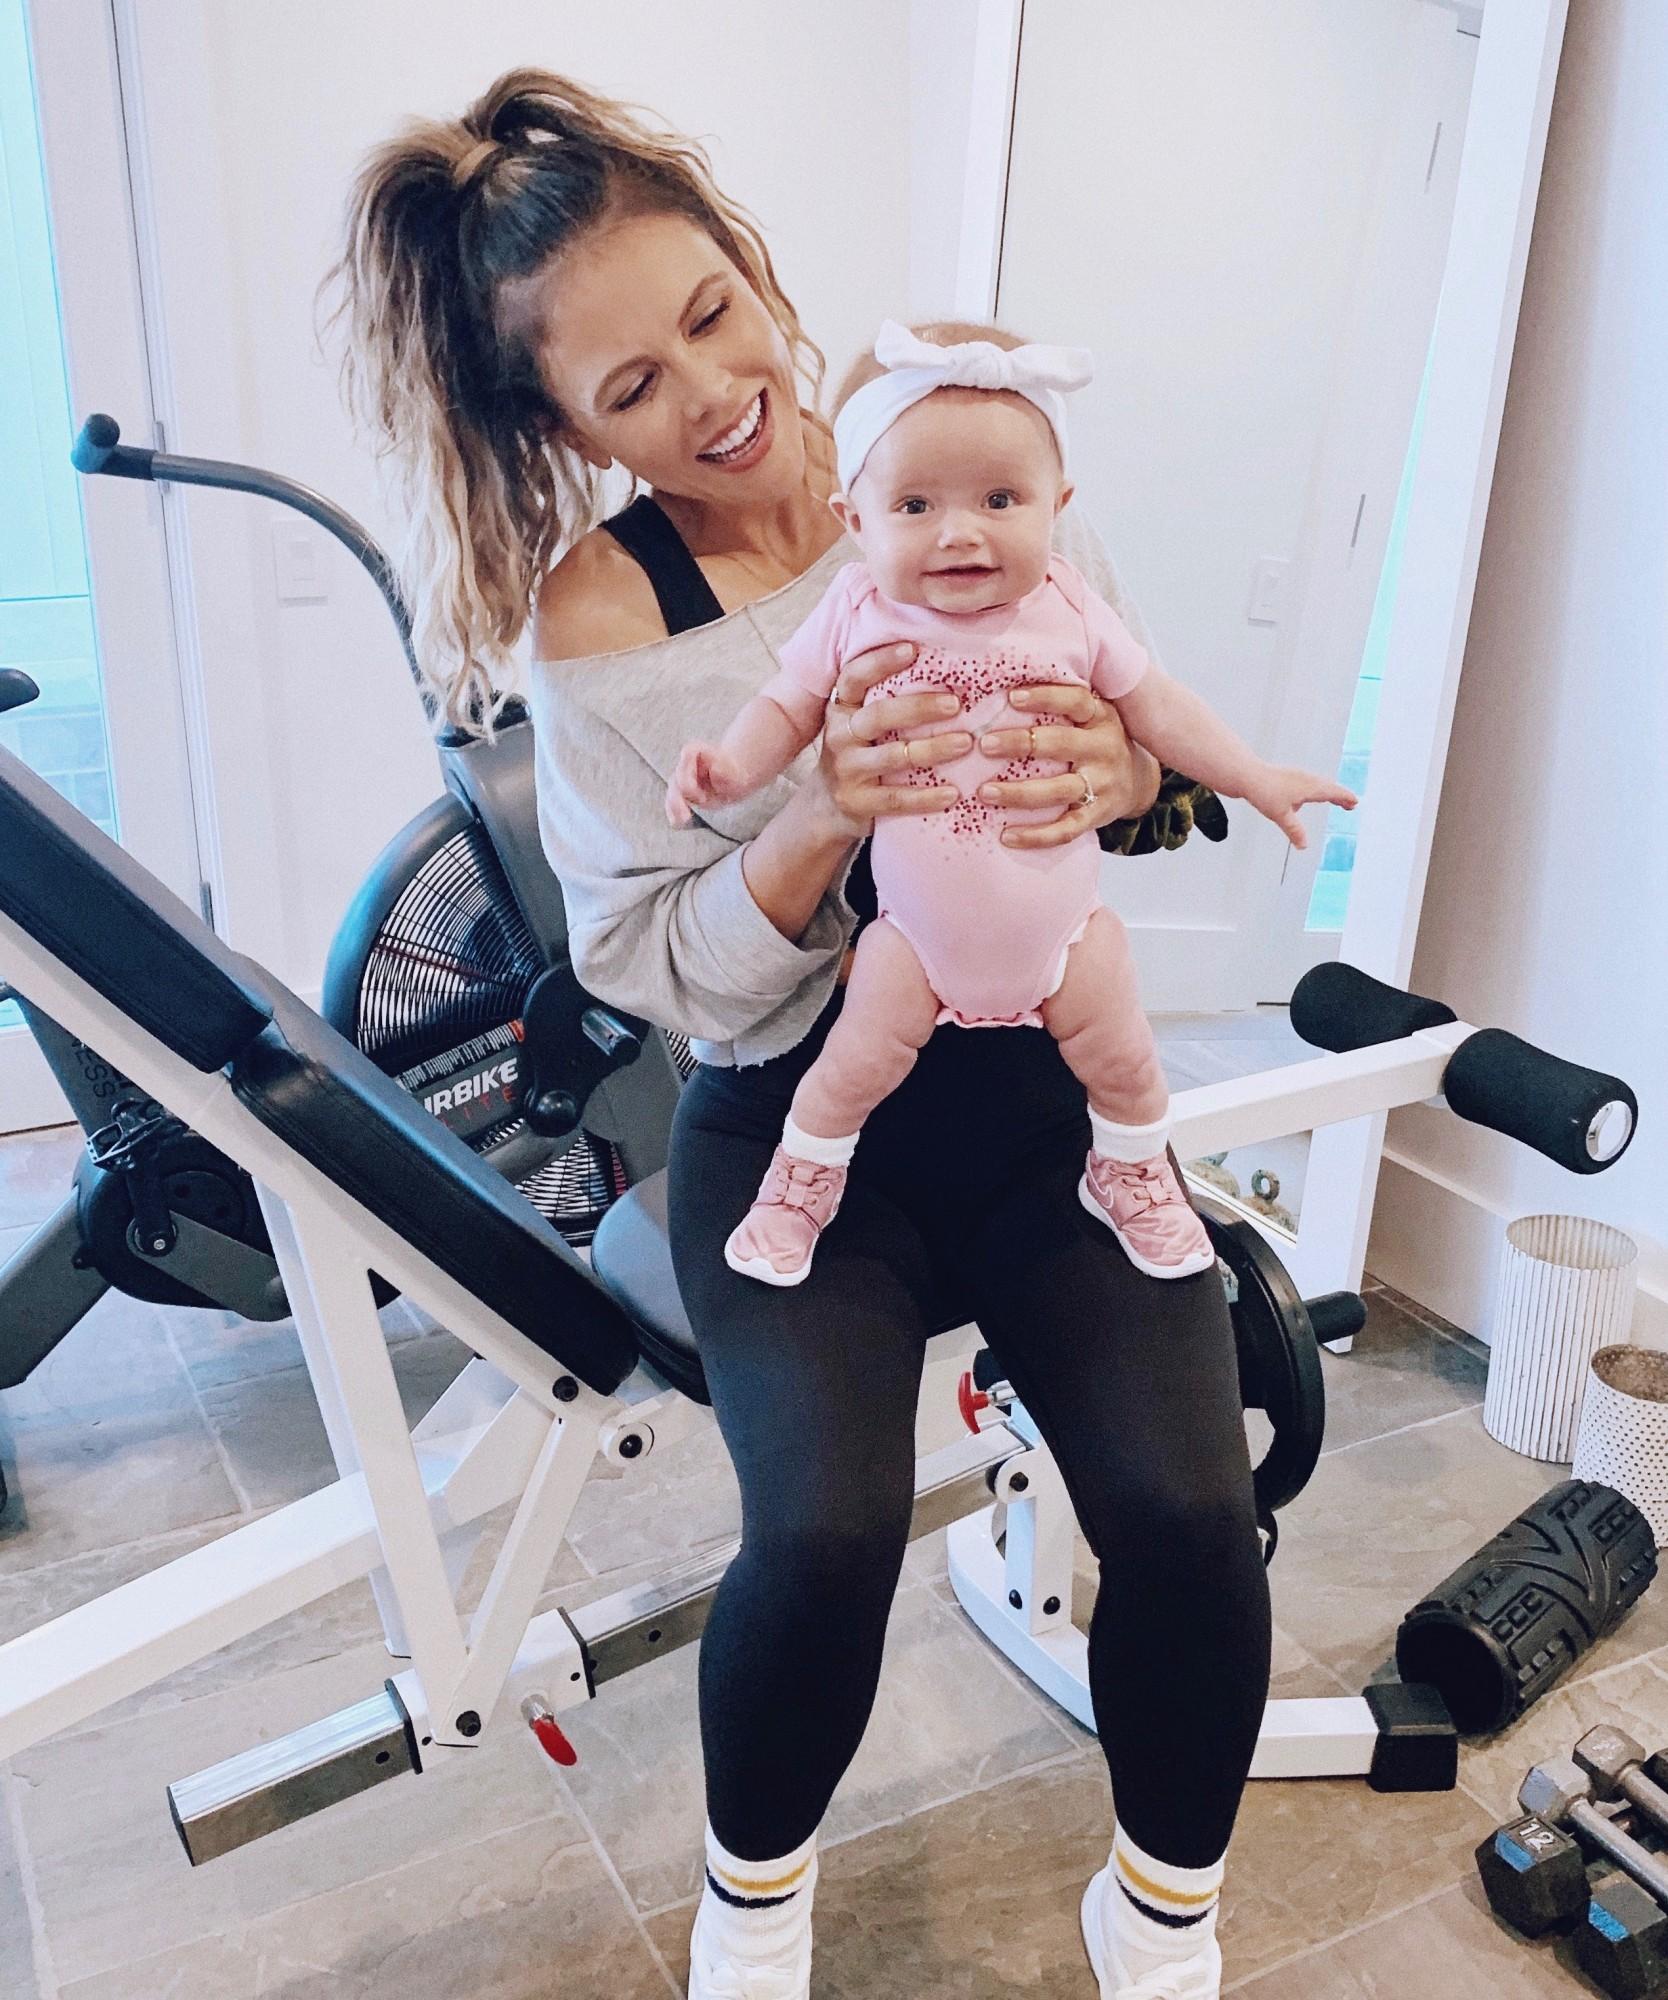 Postnatal exercises and fitness advice from Tone It Up's Katrina Scott.